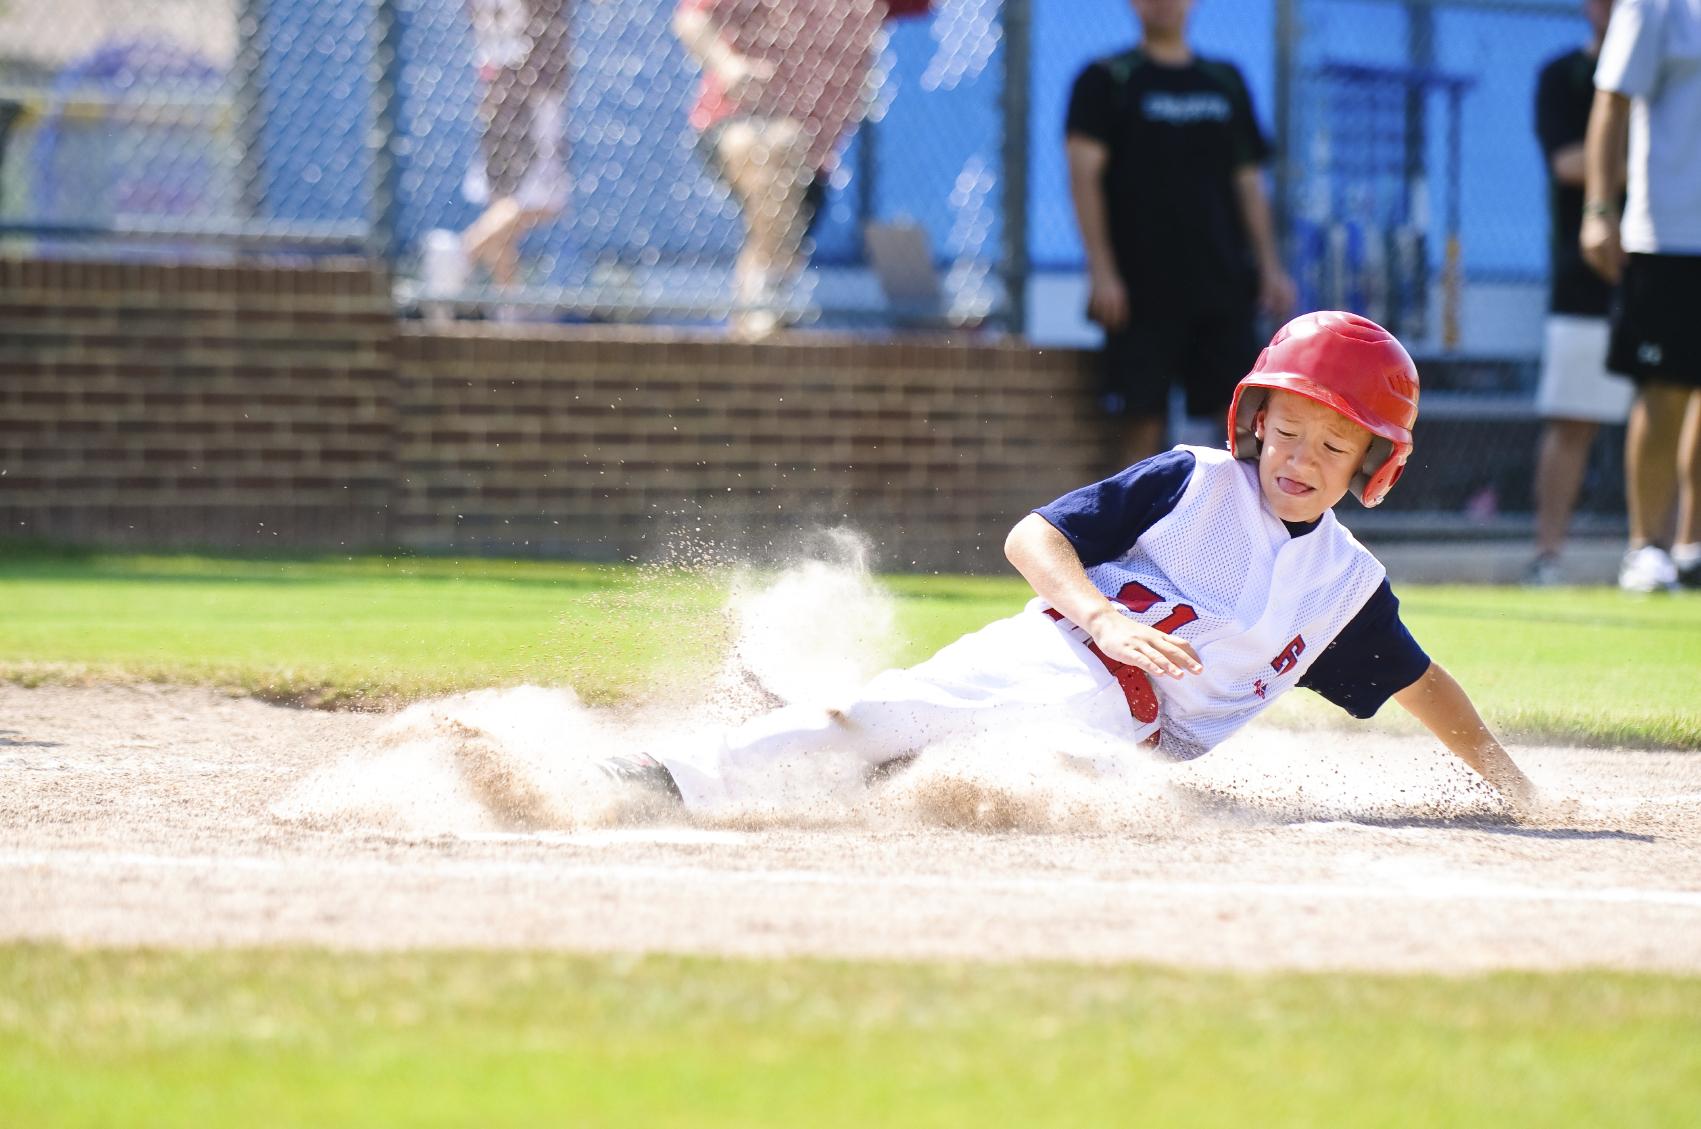 4 Ways To Organize A Productive Baseball Practice